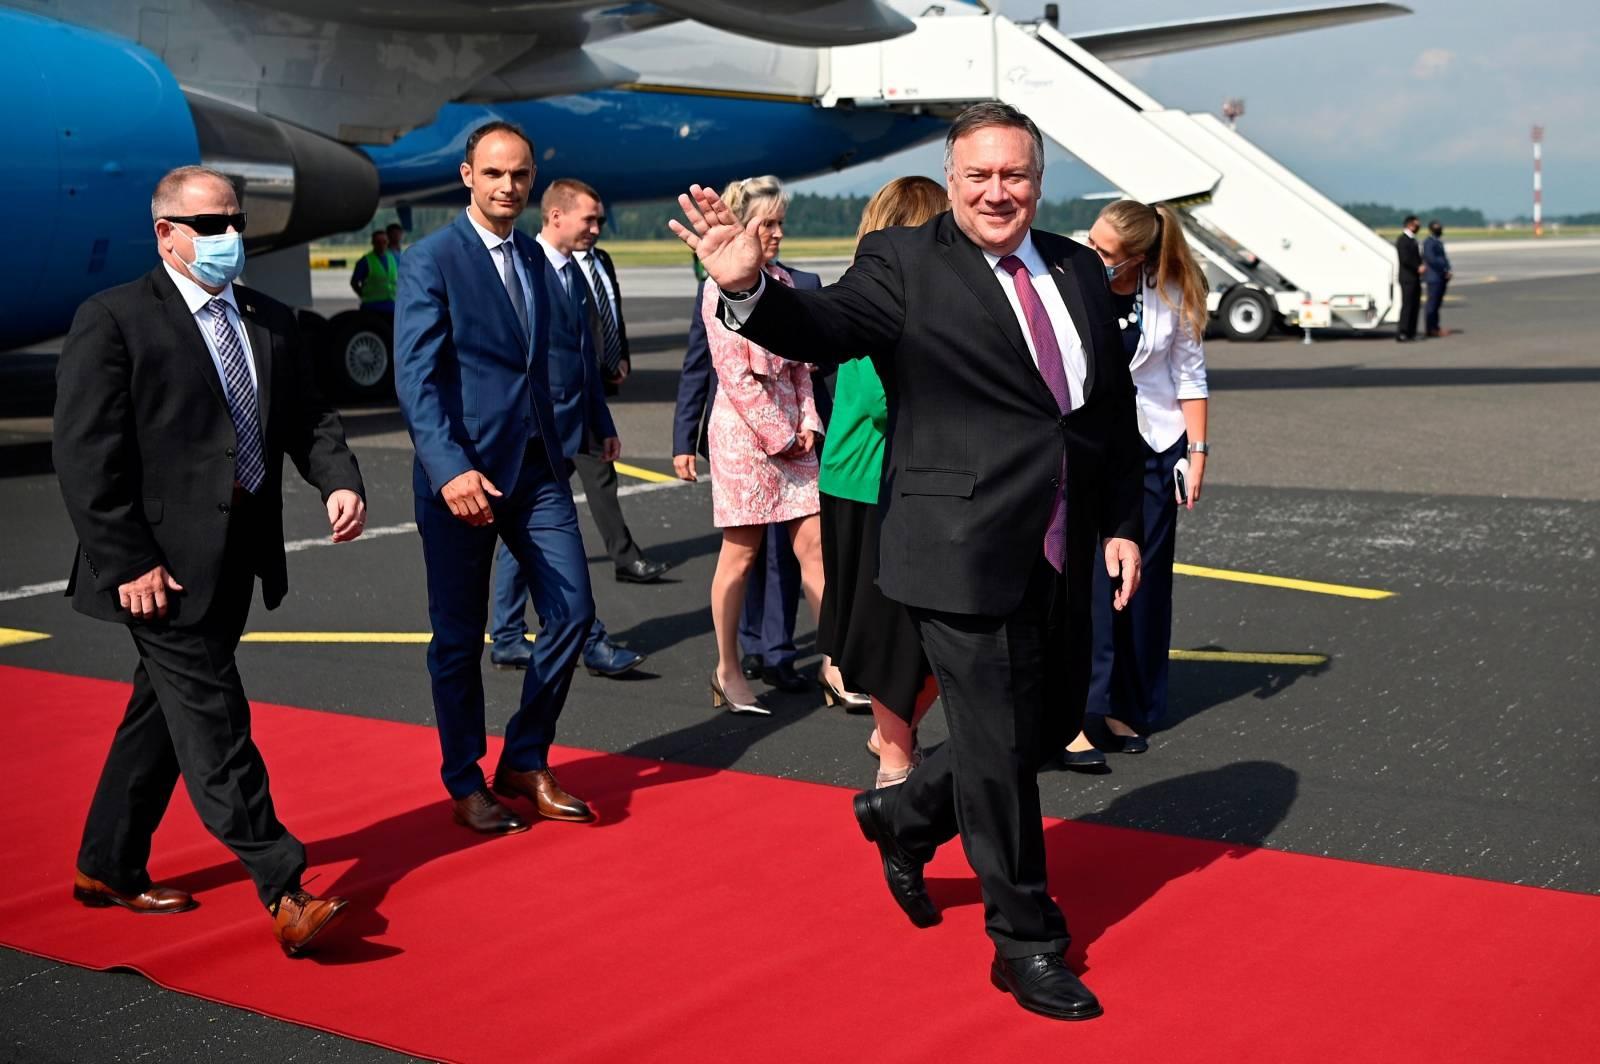 U.S. Secretary of State Pompeo arrives in Slovenia